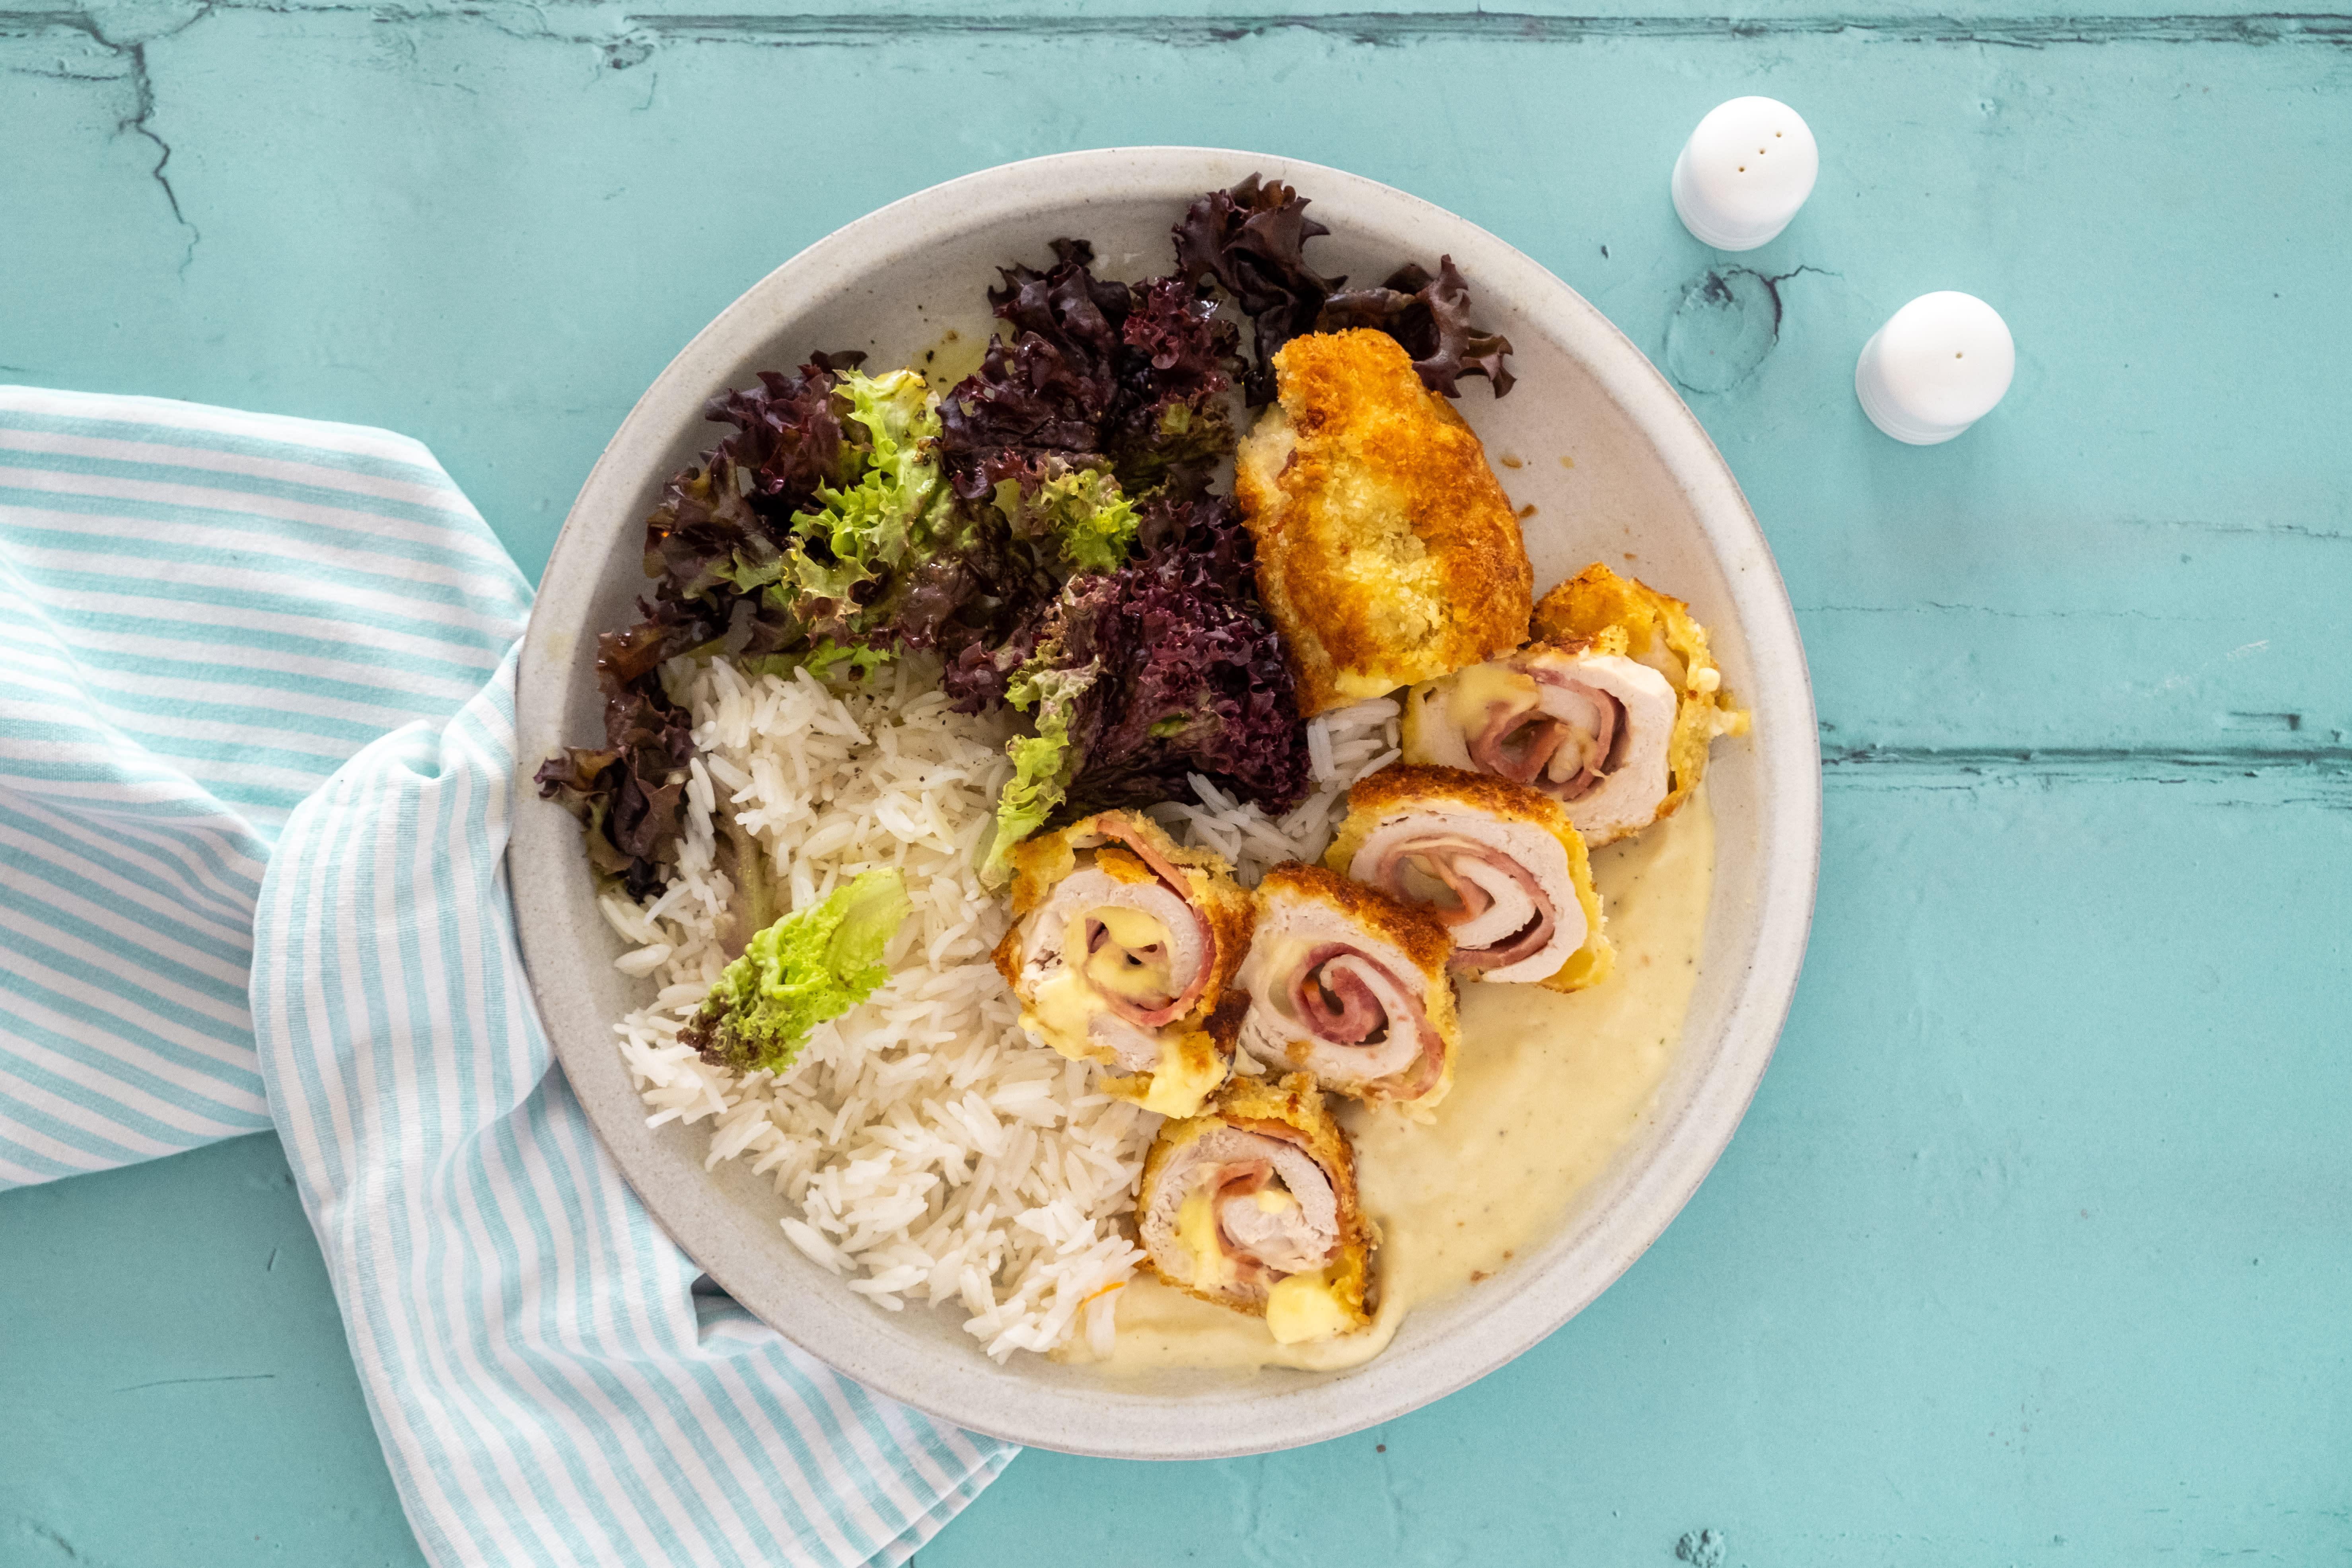 Chicken Cordon Bleu with Salad and Dijon Sauce